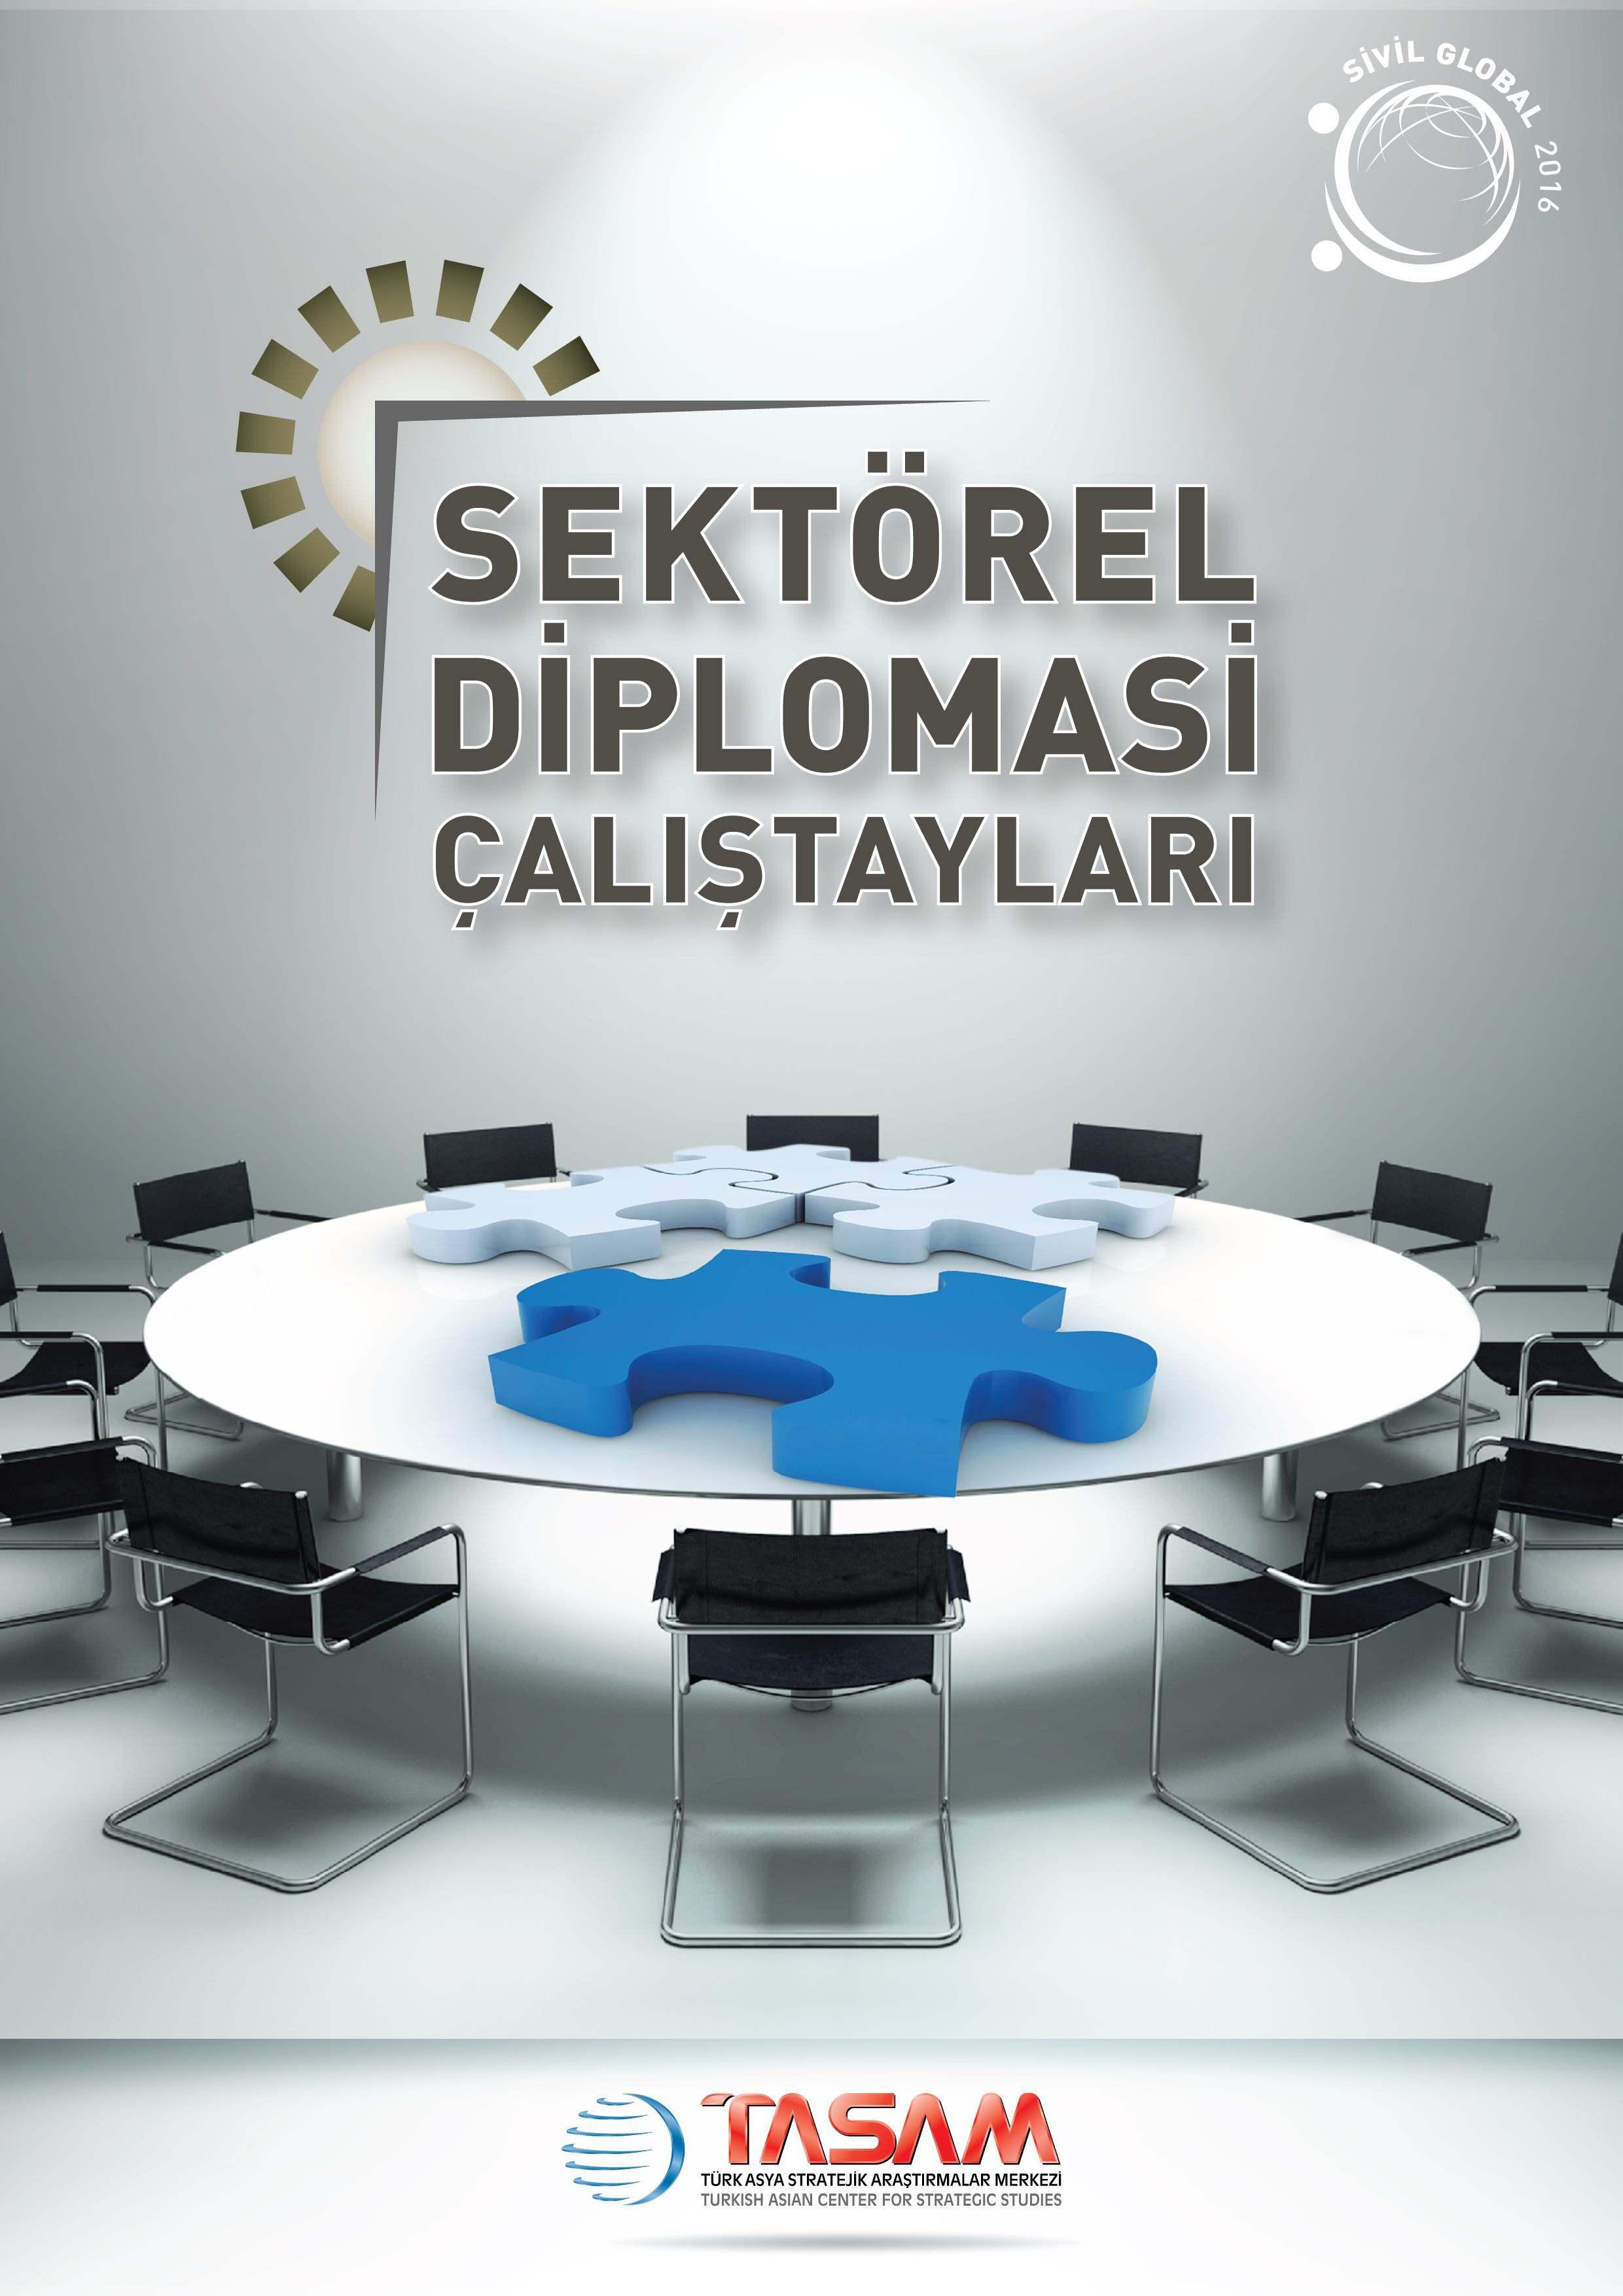 Sektörel Diplomasi Çalıştayları